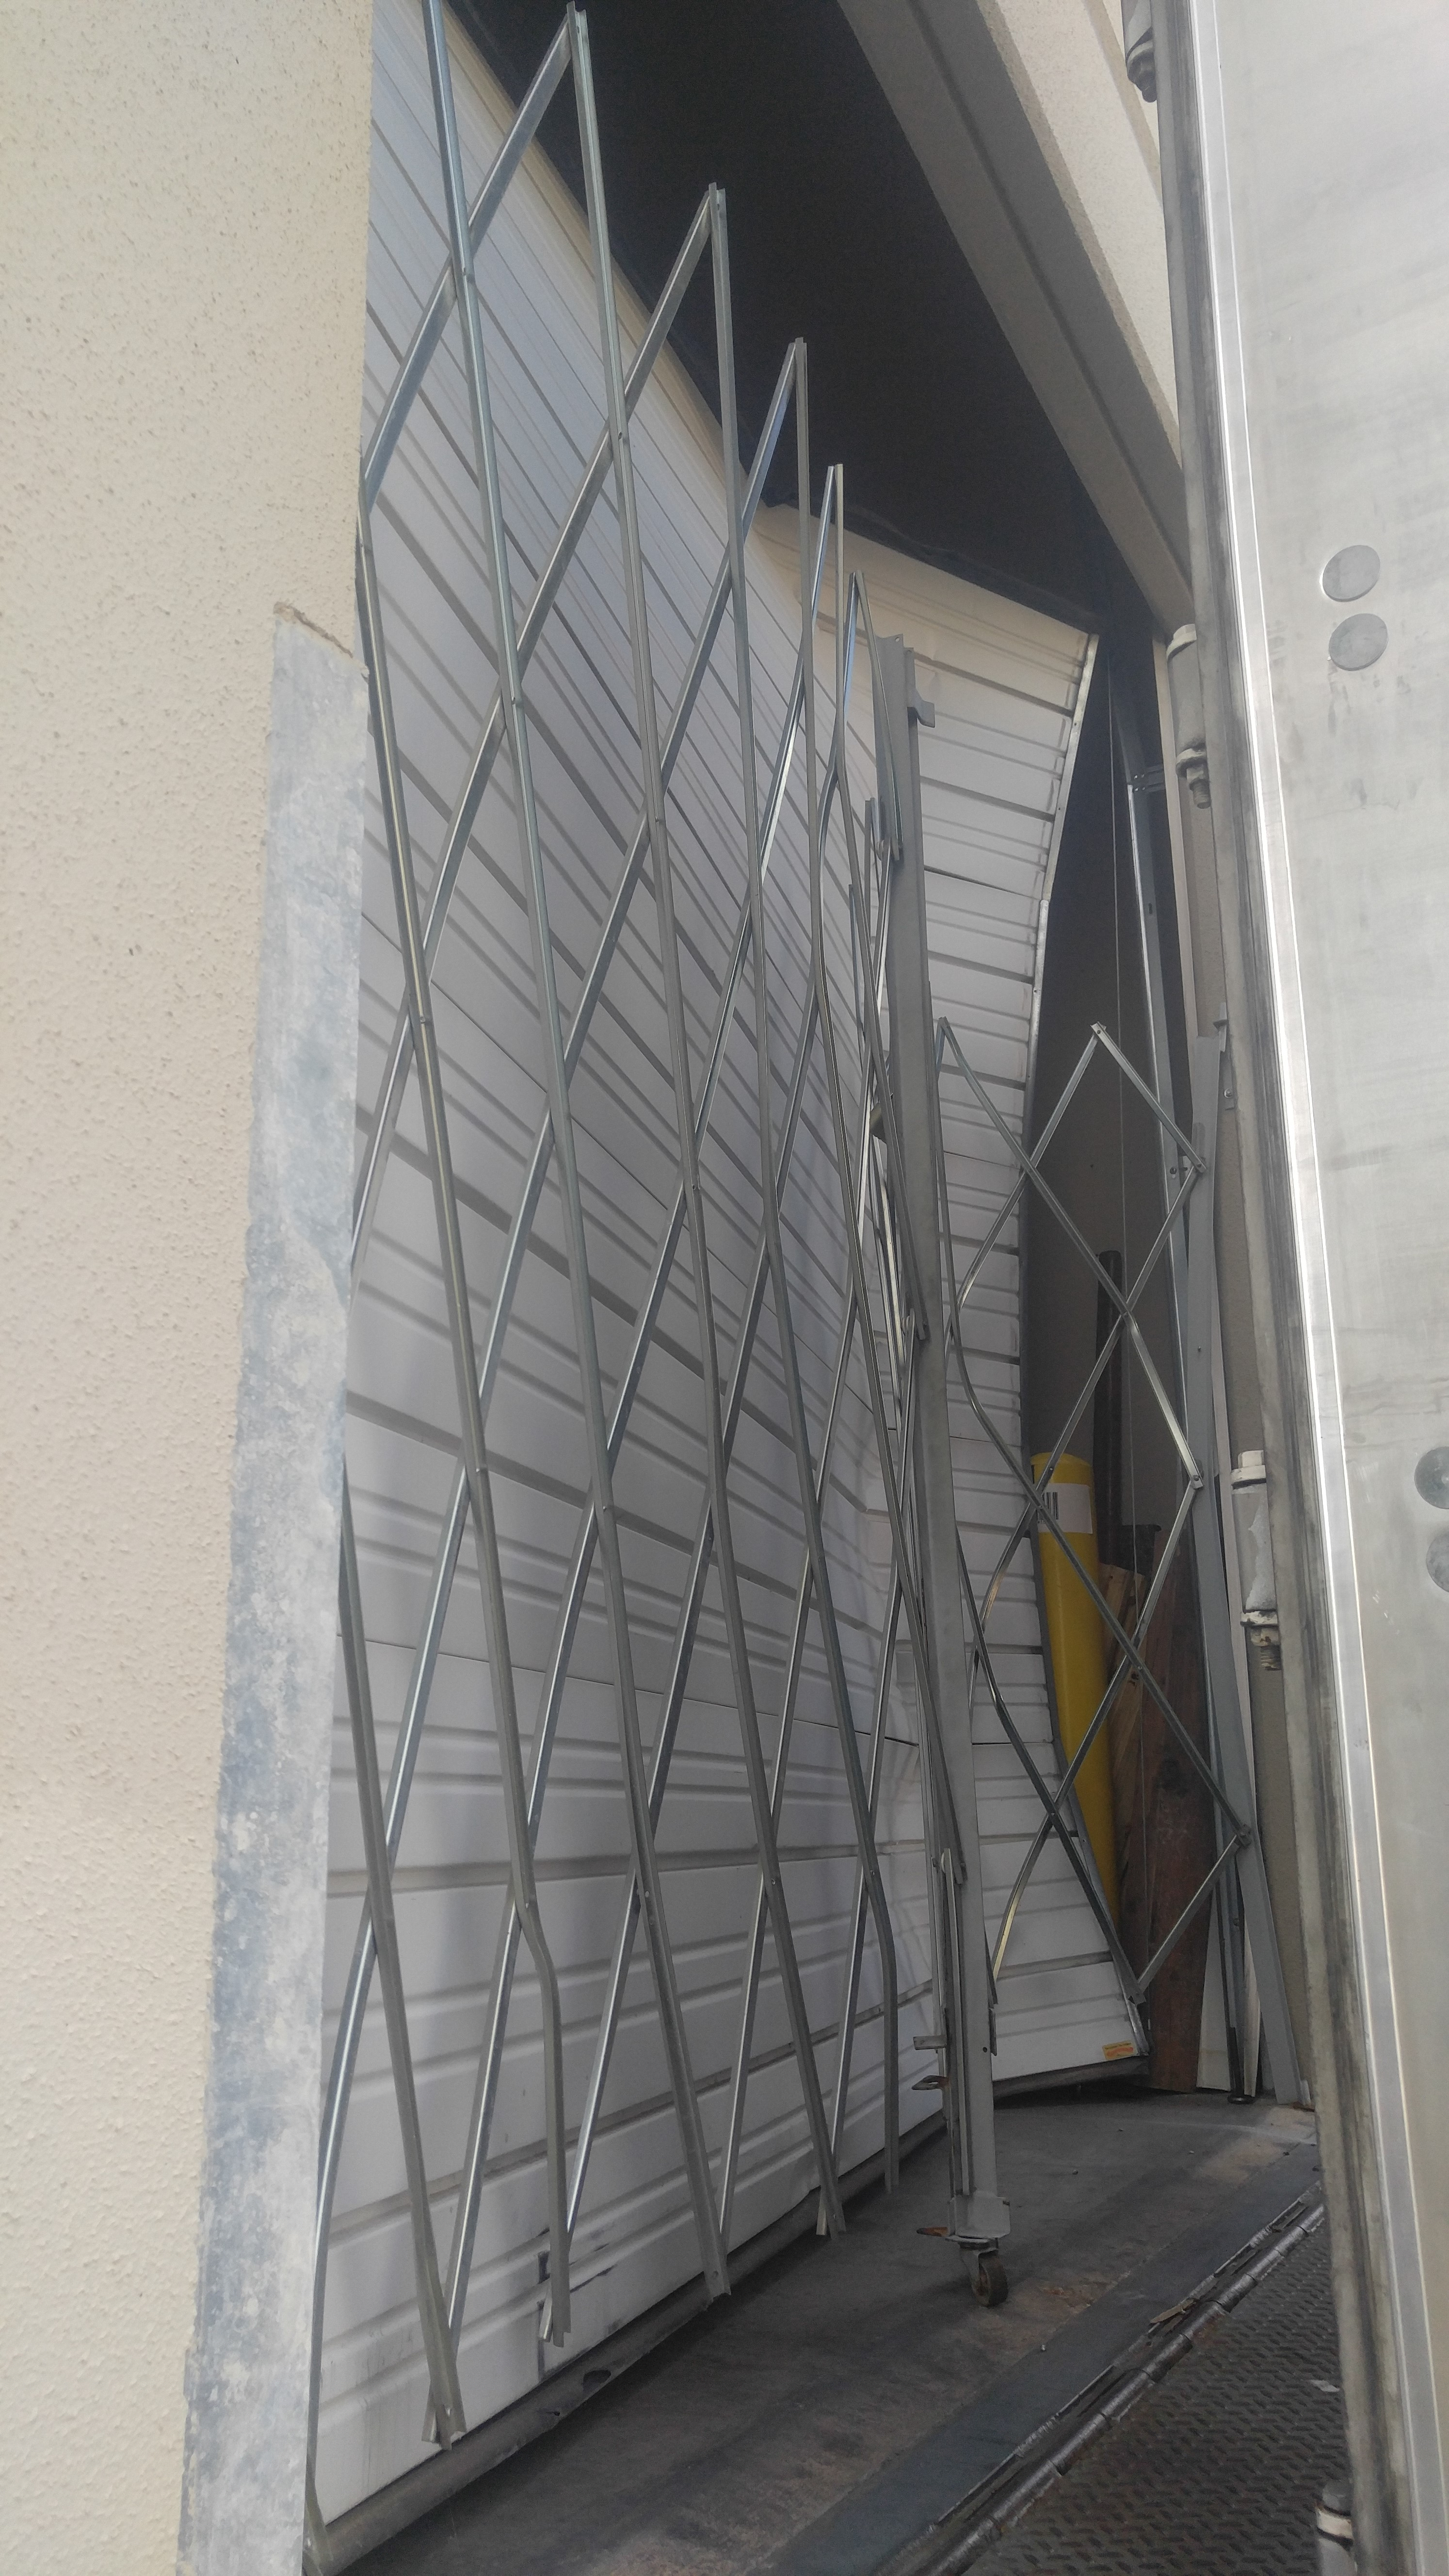 hinges enter mbgqc construction image here stack home questions door broken description garage improvement